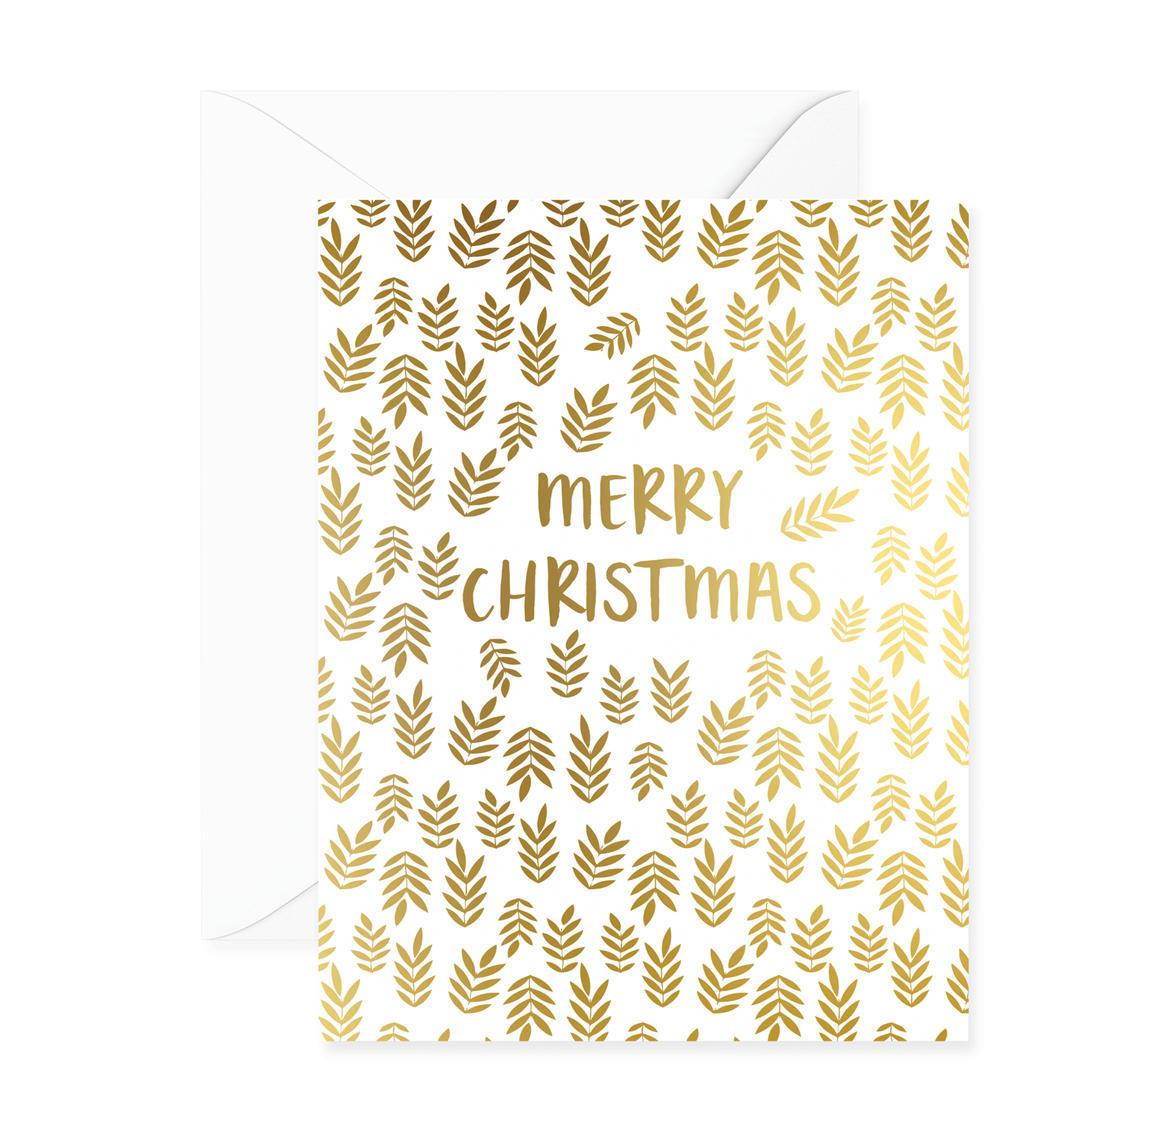 Merry Christmas Ferns Greeting Card | Trada Marketplace